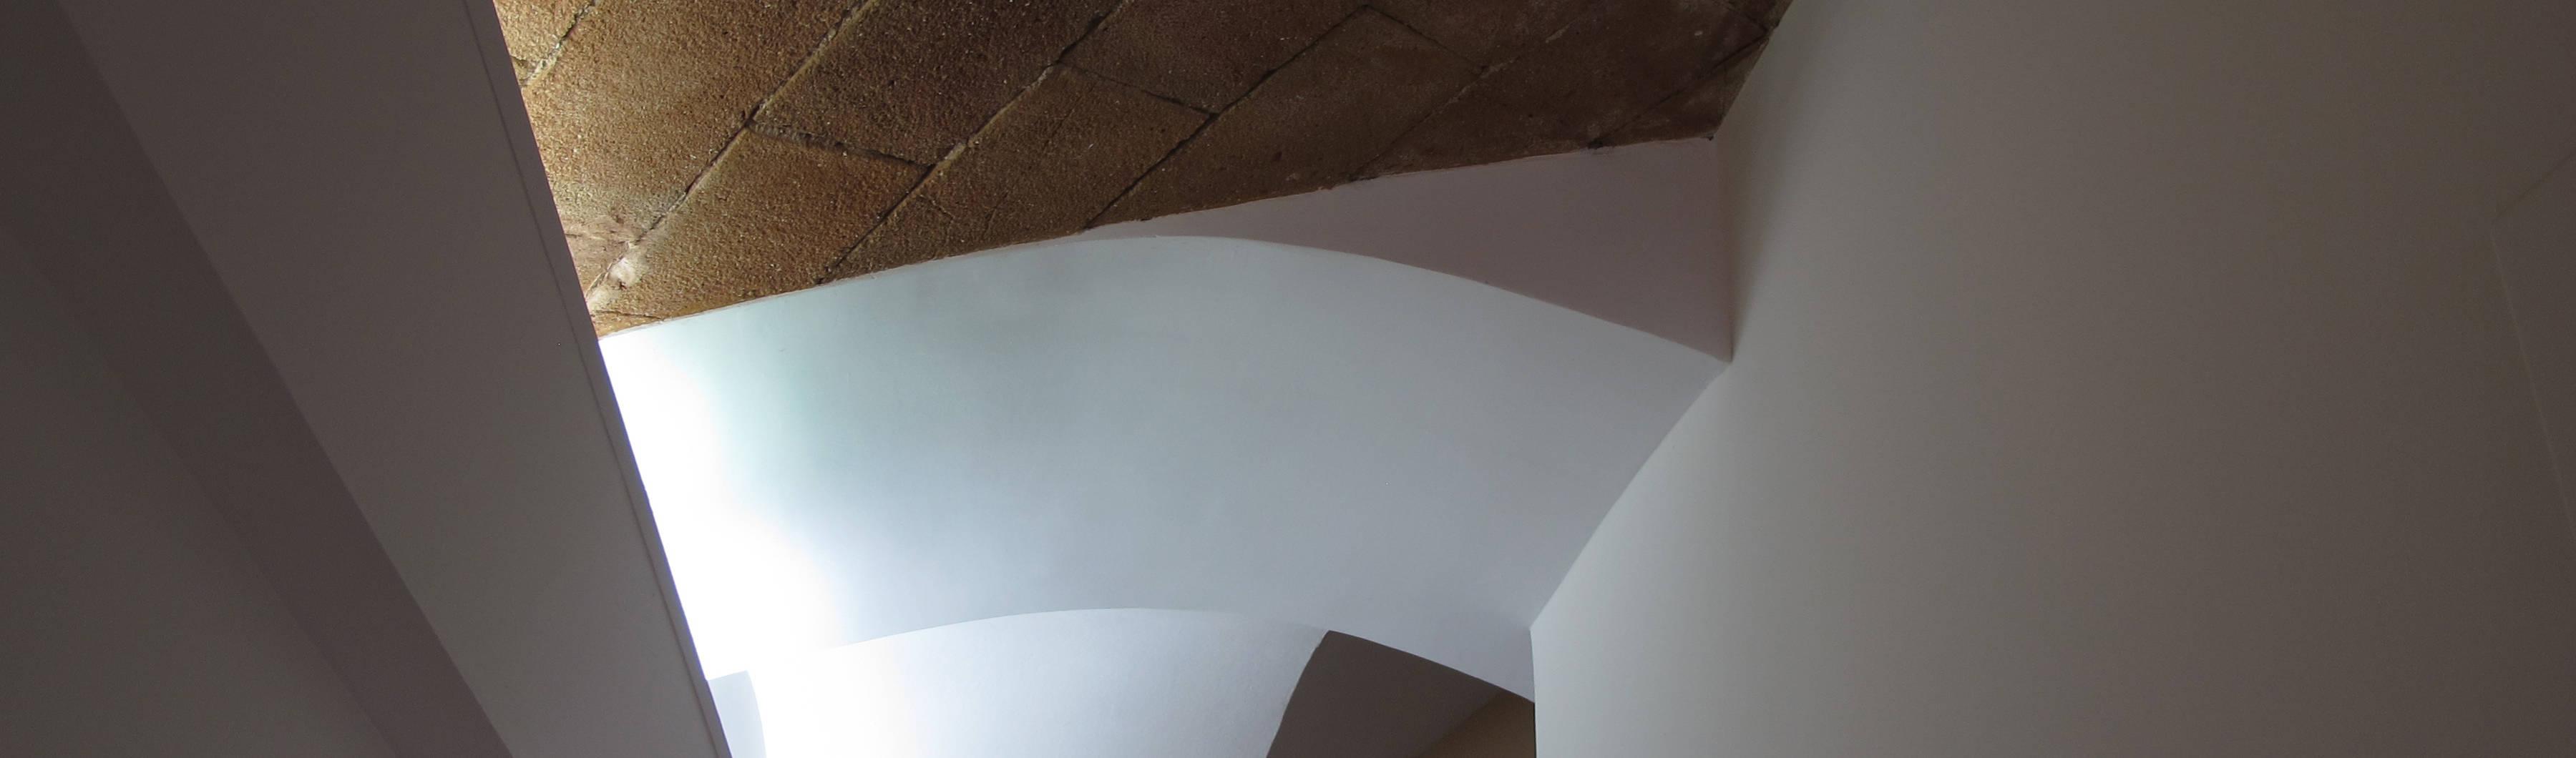 FARRIOL i COL.LABORADORS arquitectes